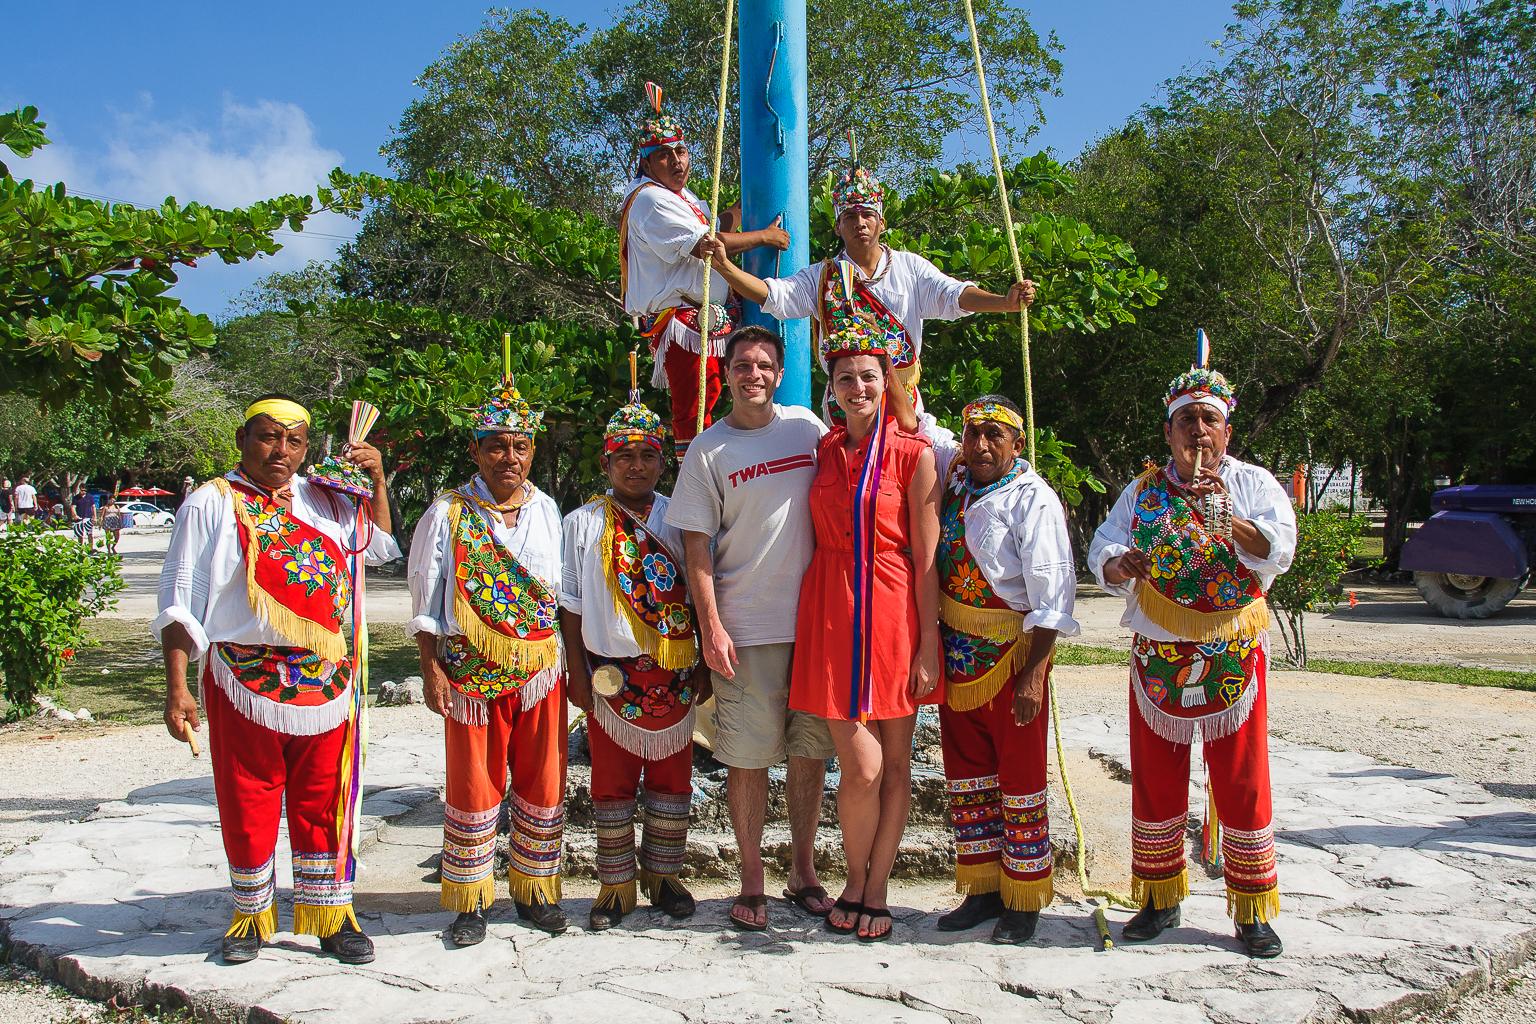 Mayan Swing Performers